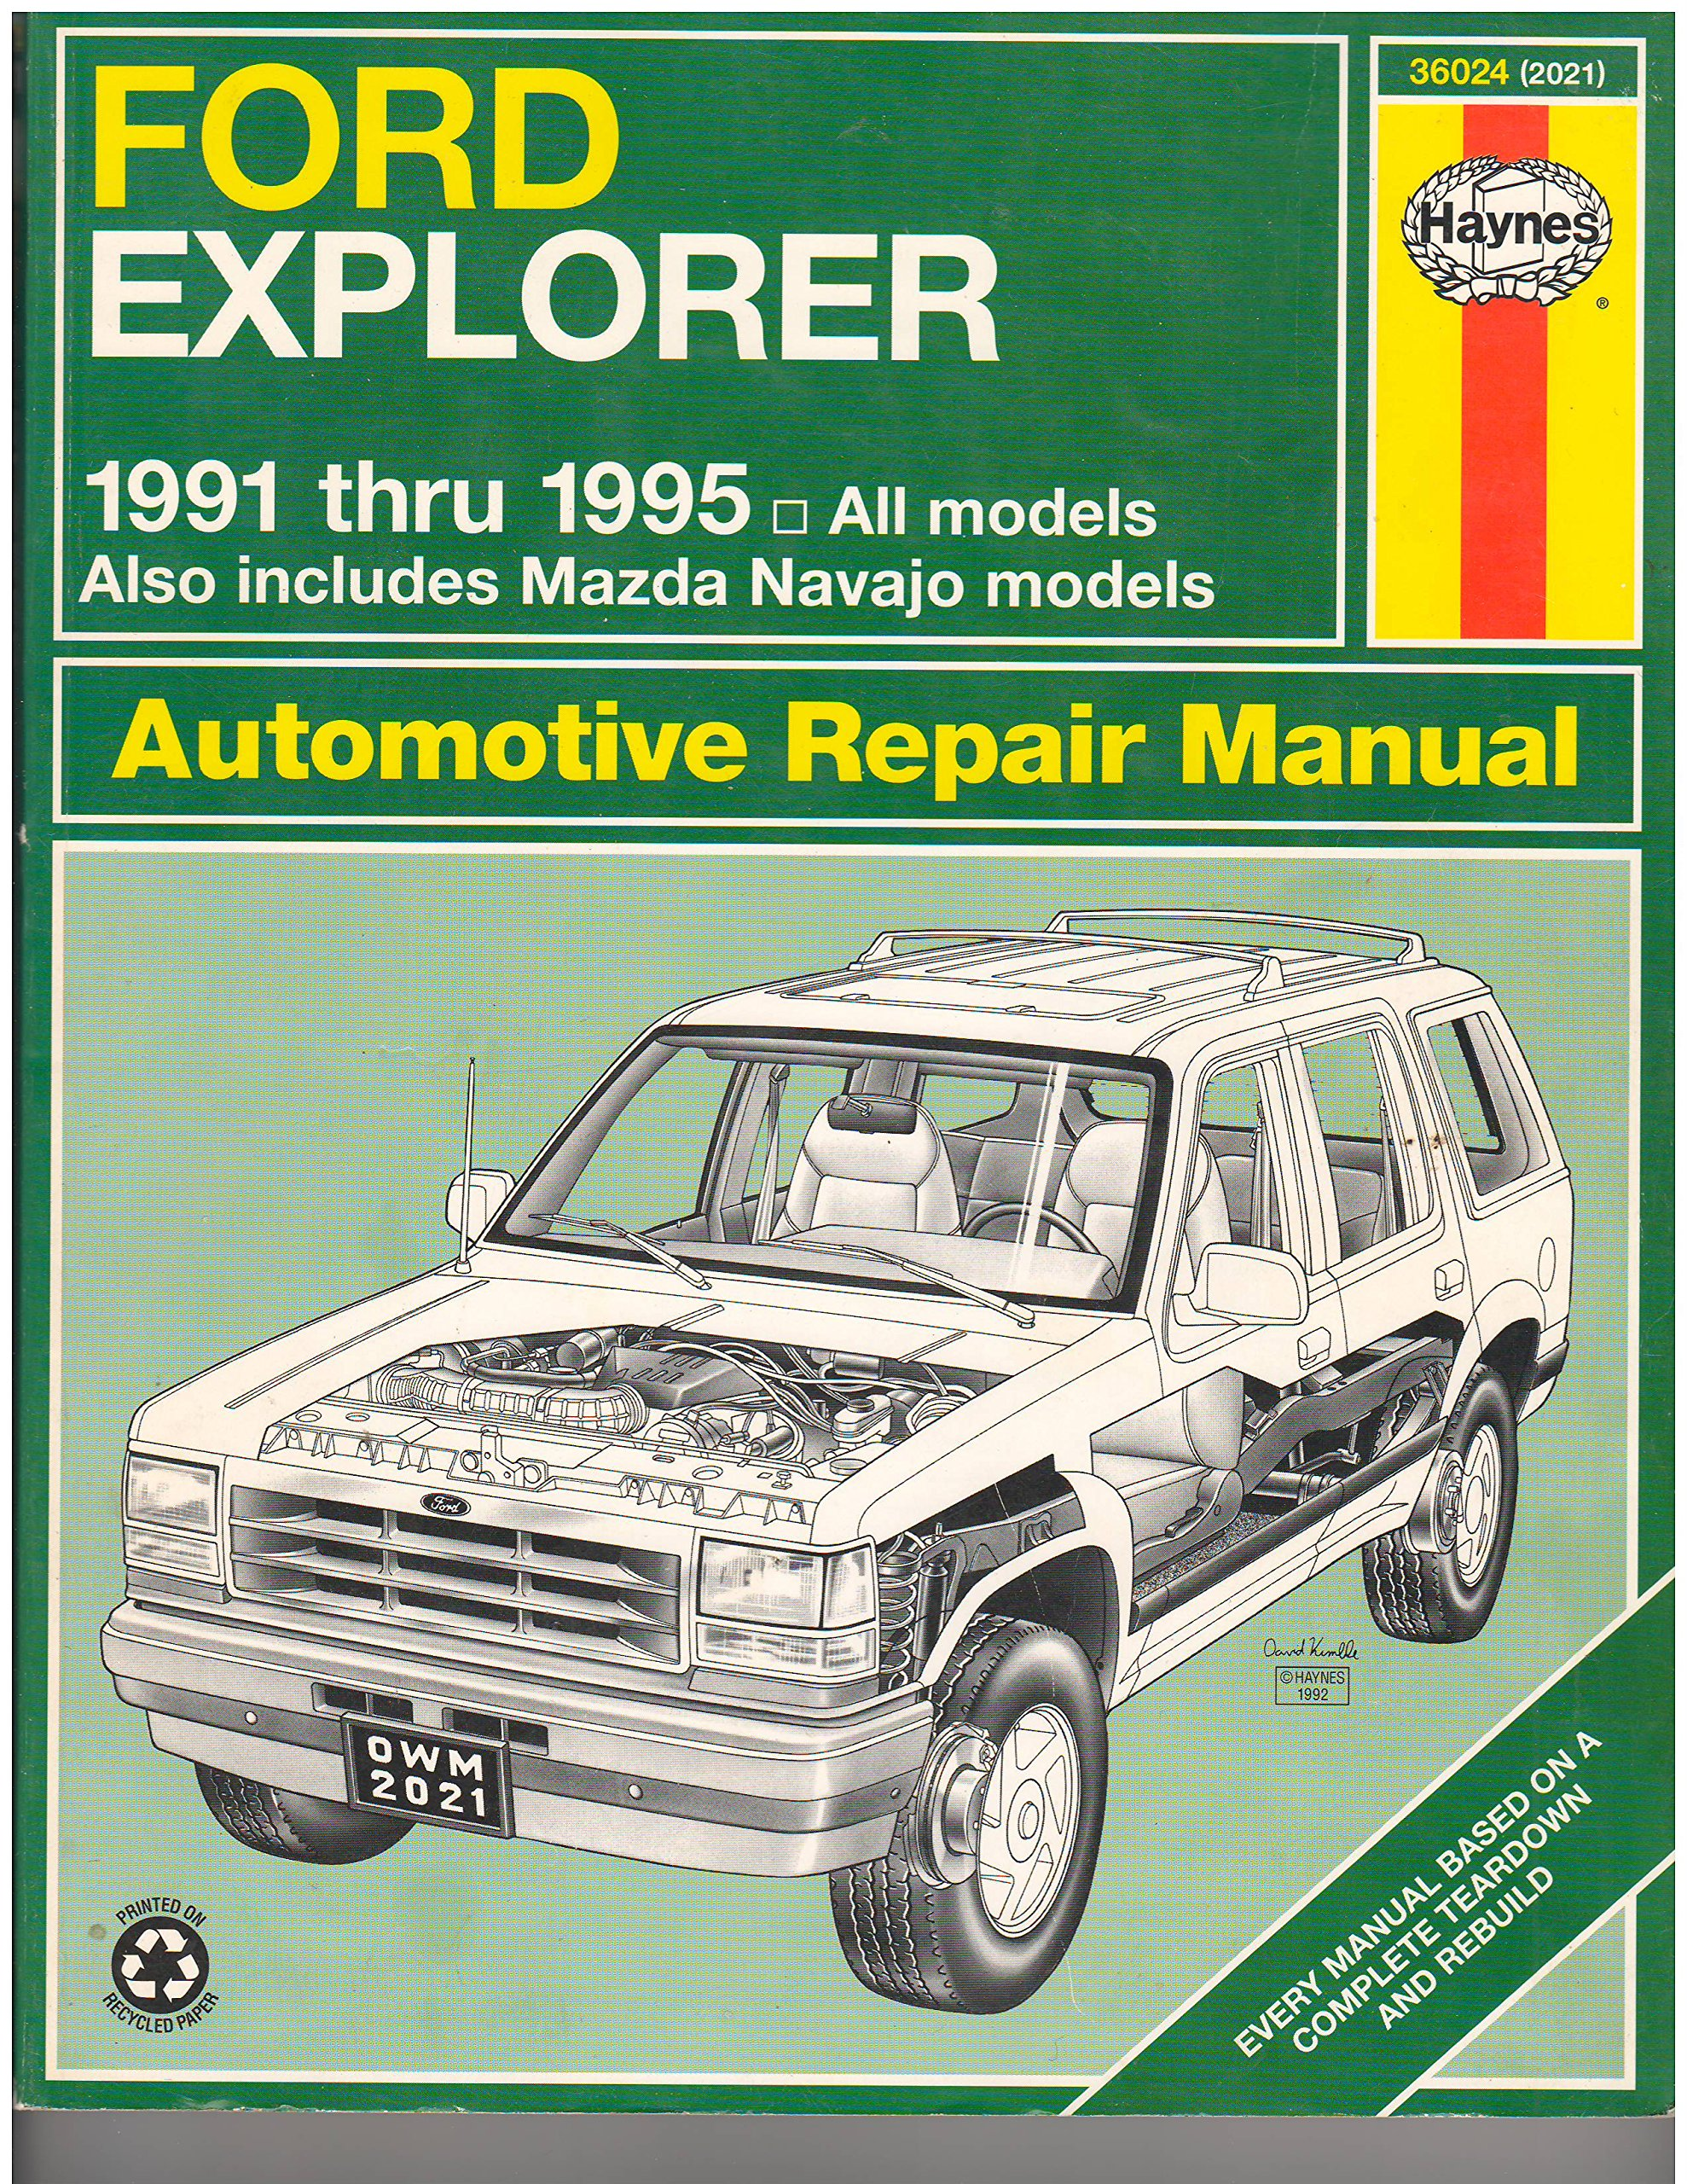 Ford Explorer & Mazda Navajo Automotive Repair Manual: All Ford Explorer  and Mazda Navajo Models 1991 Through 1995 (Hayne's Automotive Repair Manual):  Alan ...